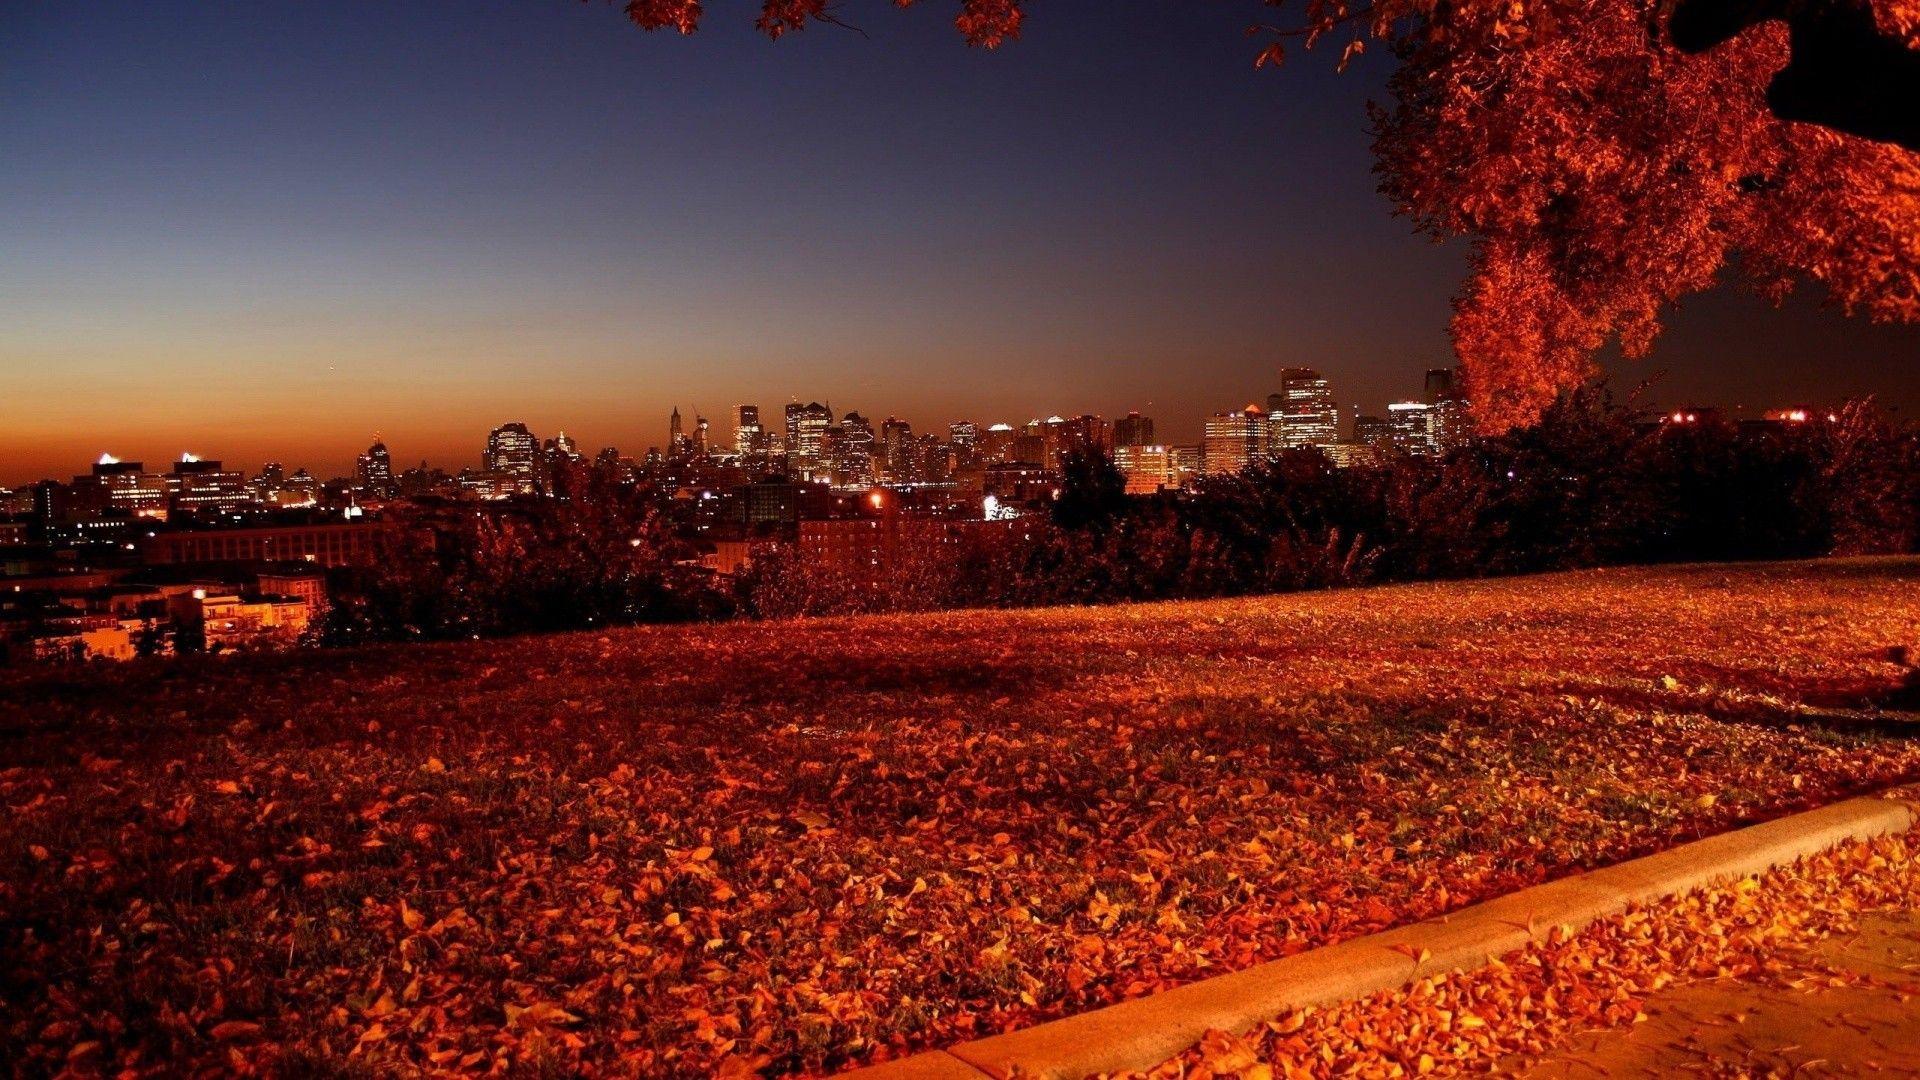 Autumn night picture (1920x1080, night, picture) via www